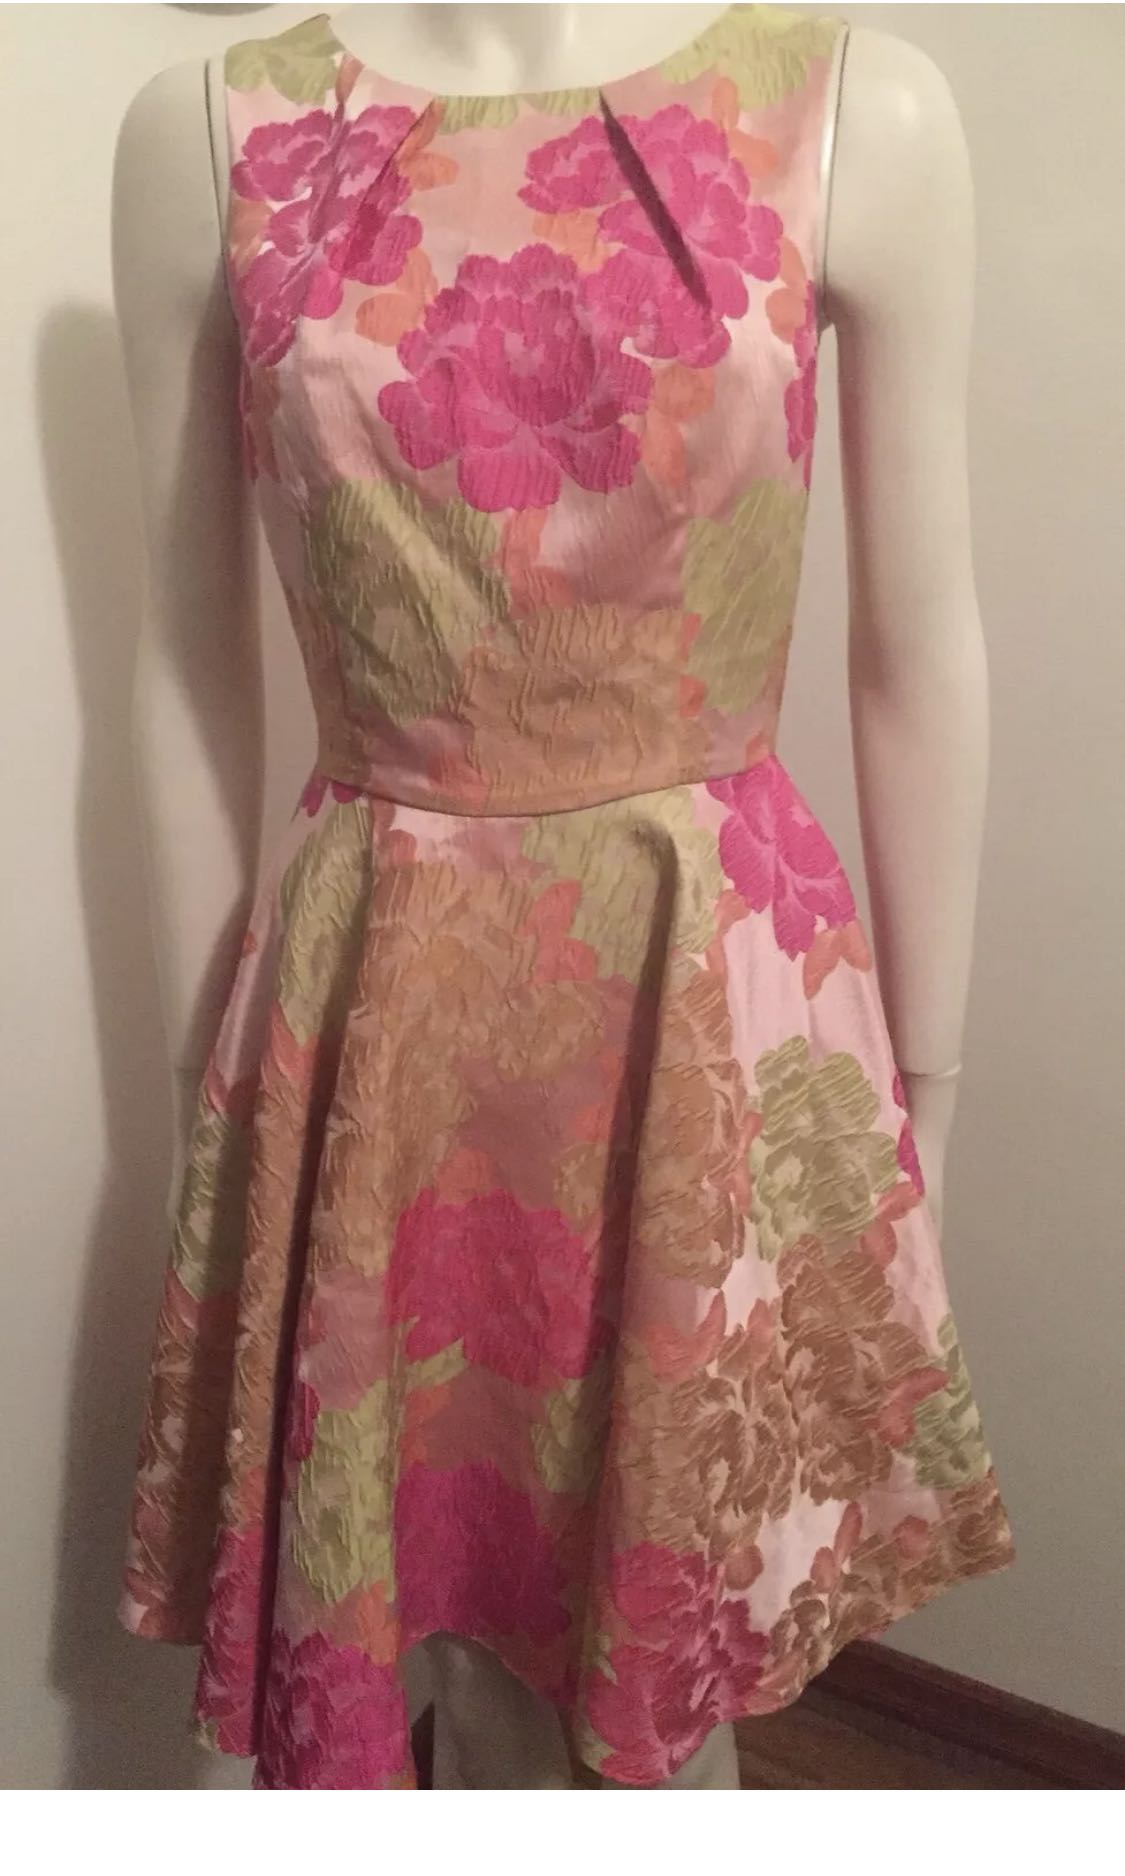 Review floral dress size 8